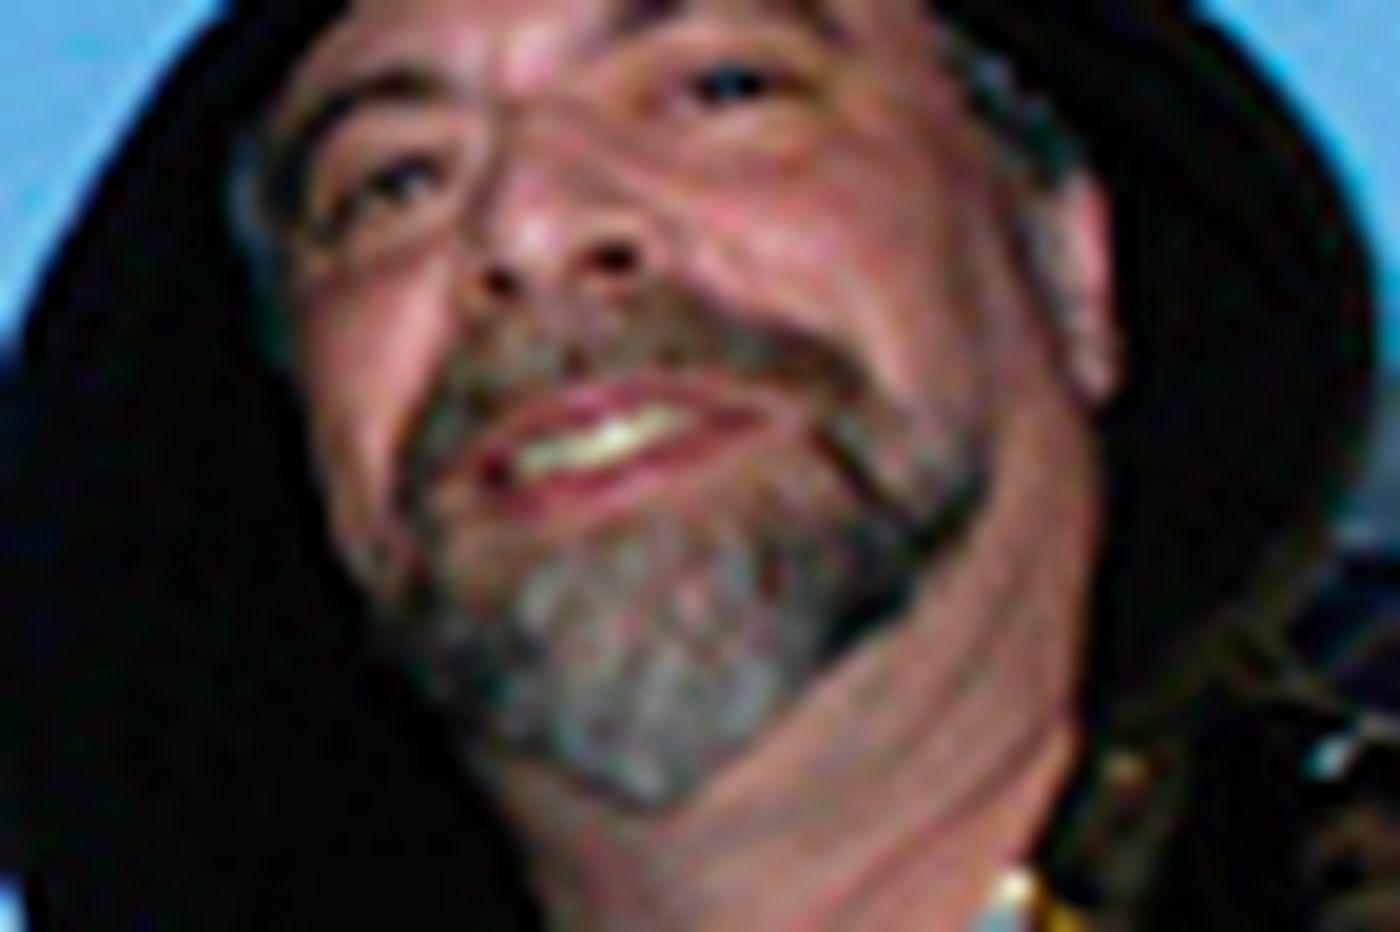 Former Pagans leader Mondevergine arrested on attempted-murder charge